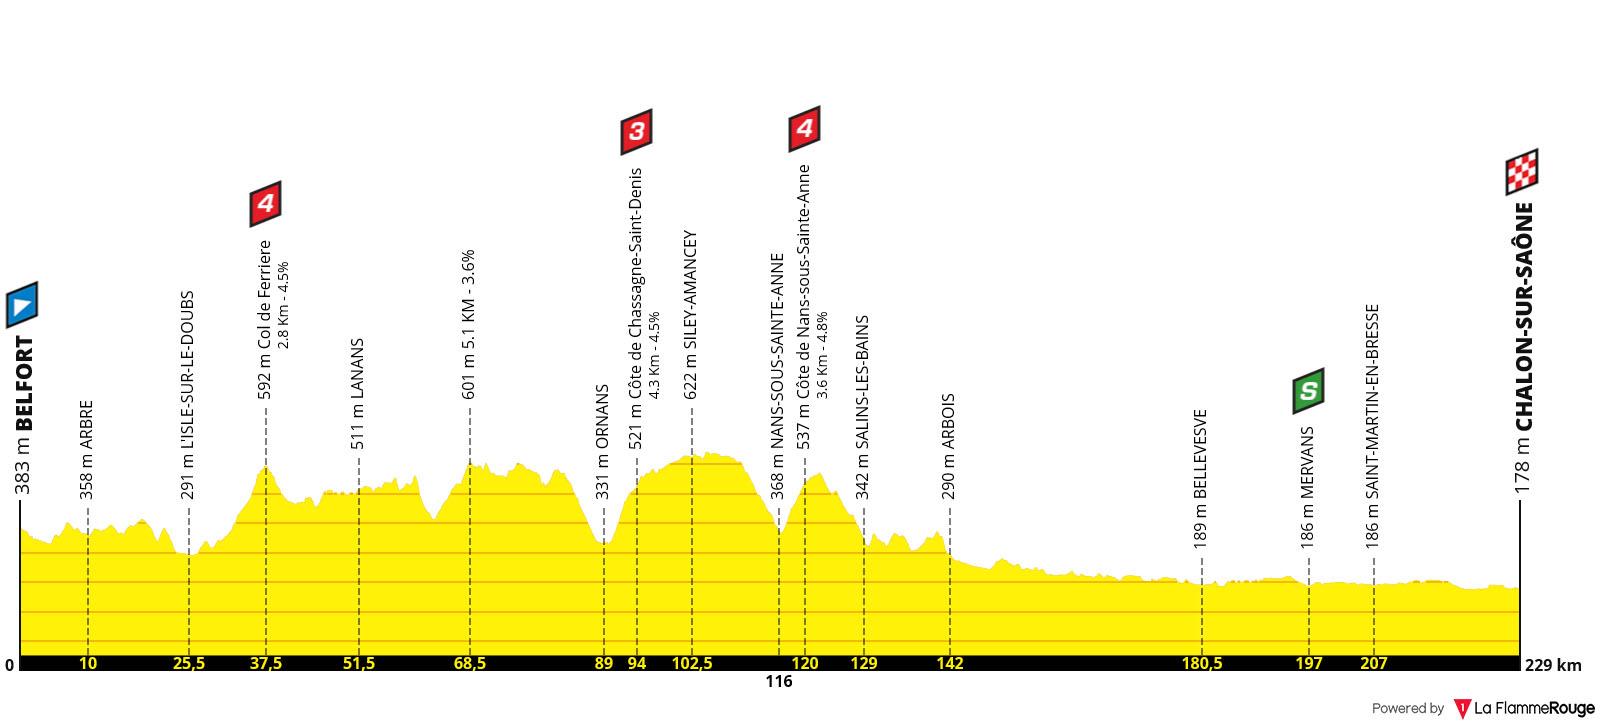 Perfil Etapa 07 - Tour de Francia 2019